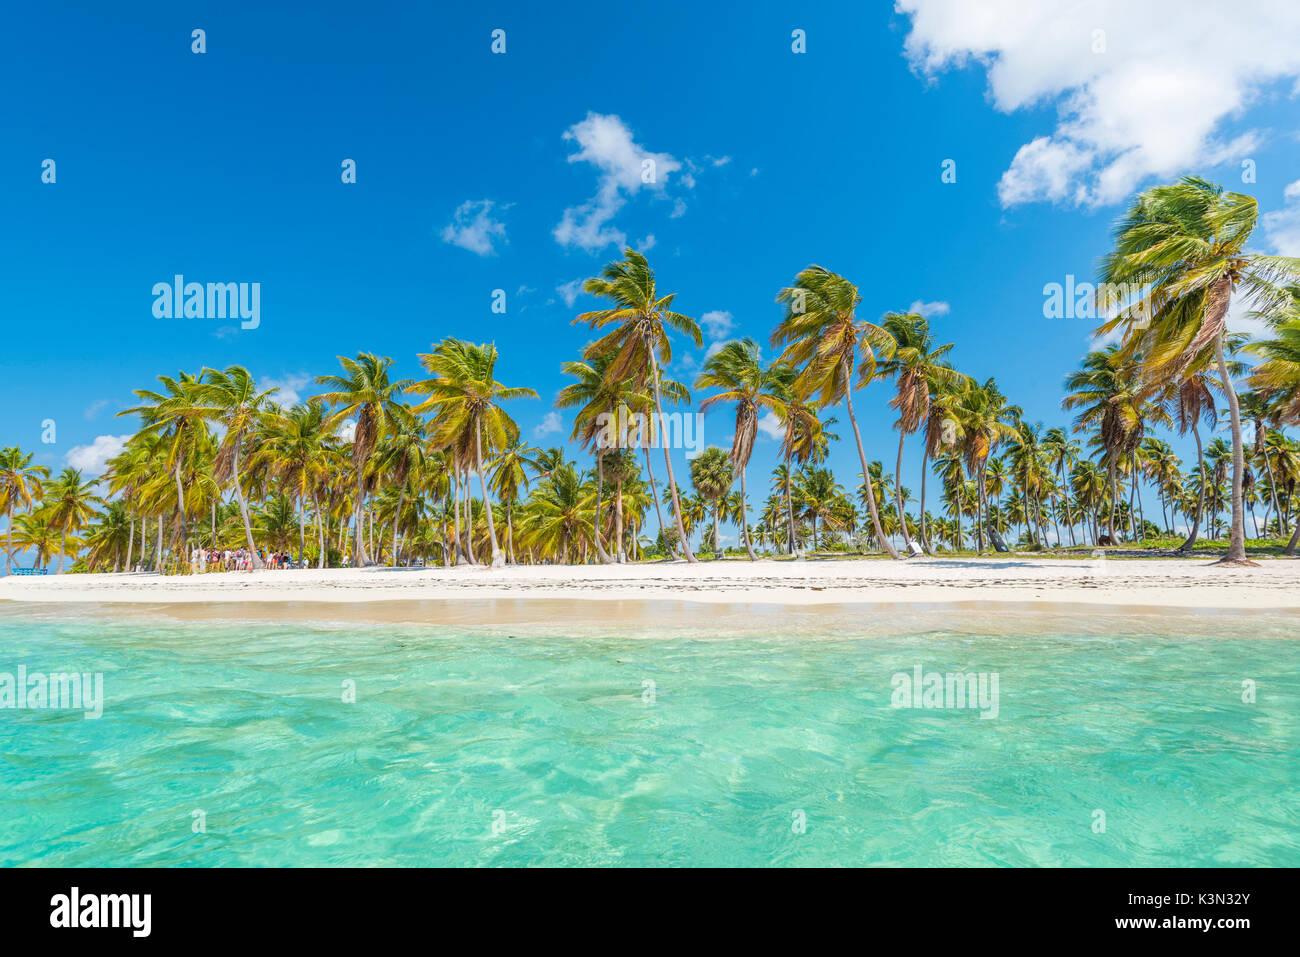 Canto de la Playa, Saona, East National Park (Parque Nacional del Este), Dominikanische Republik, Karibik. Stockbild